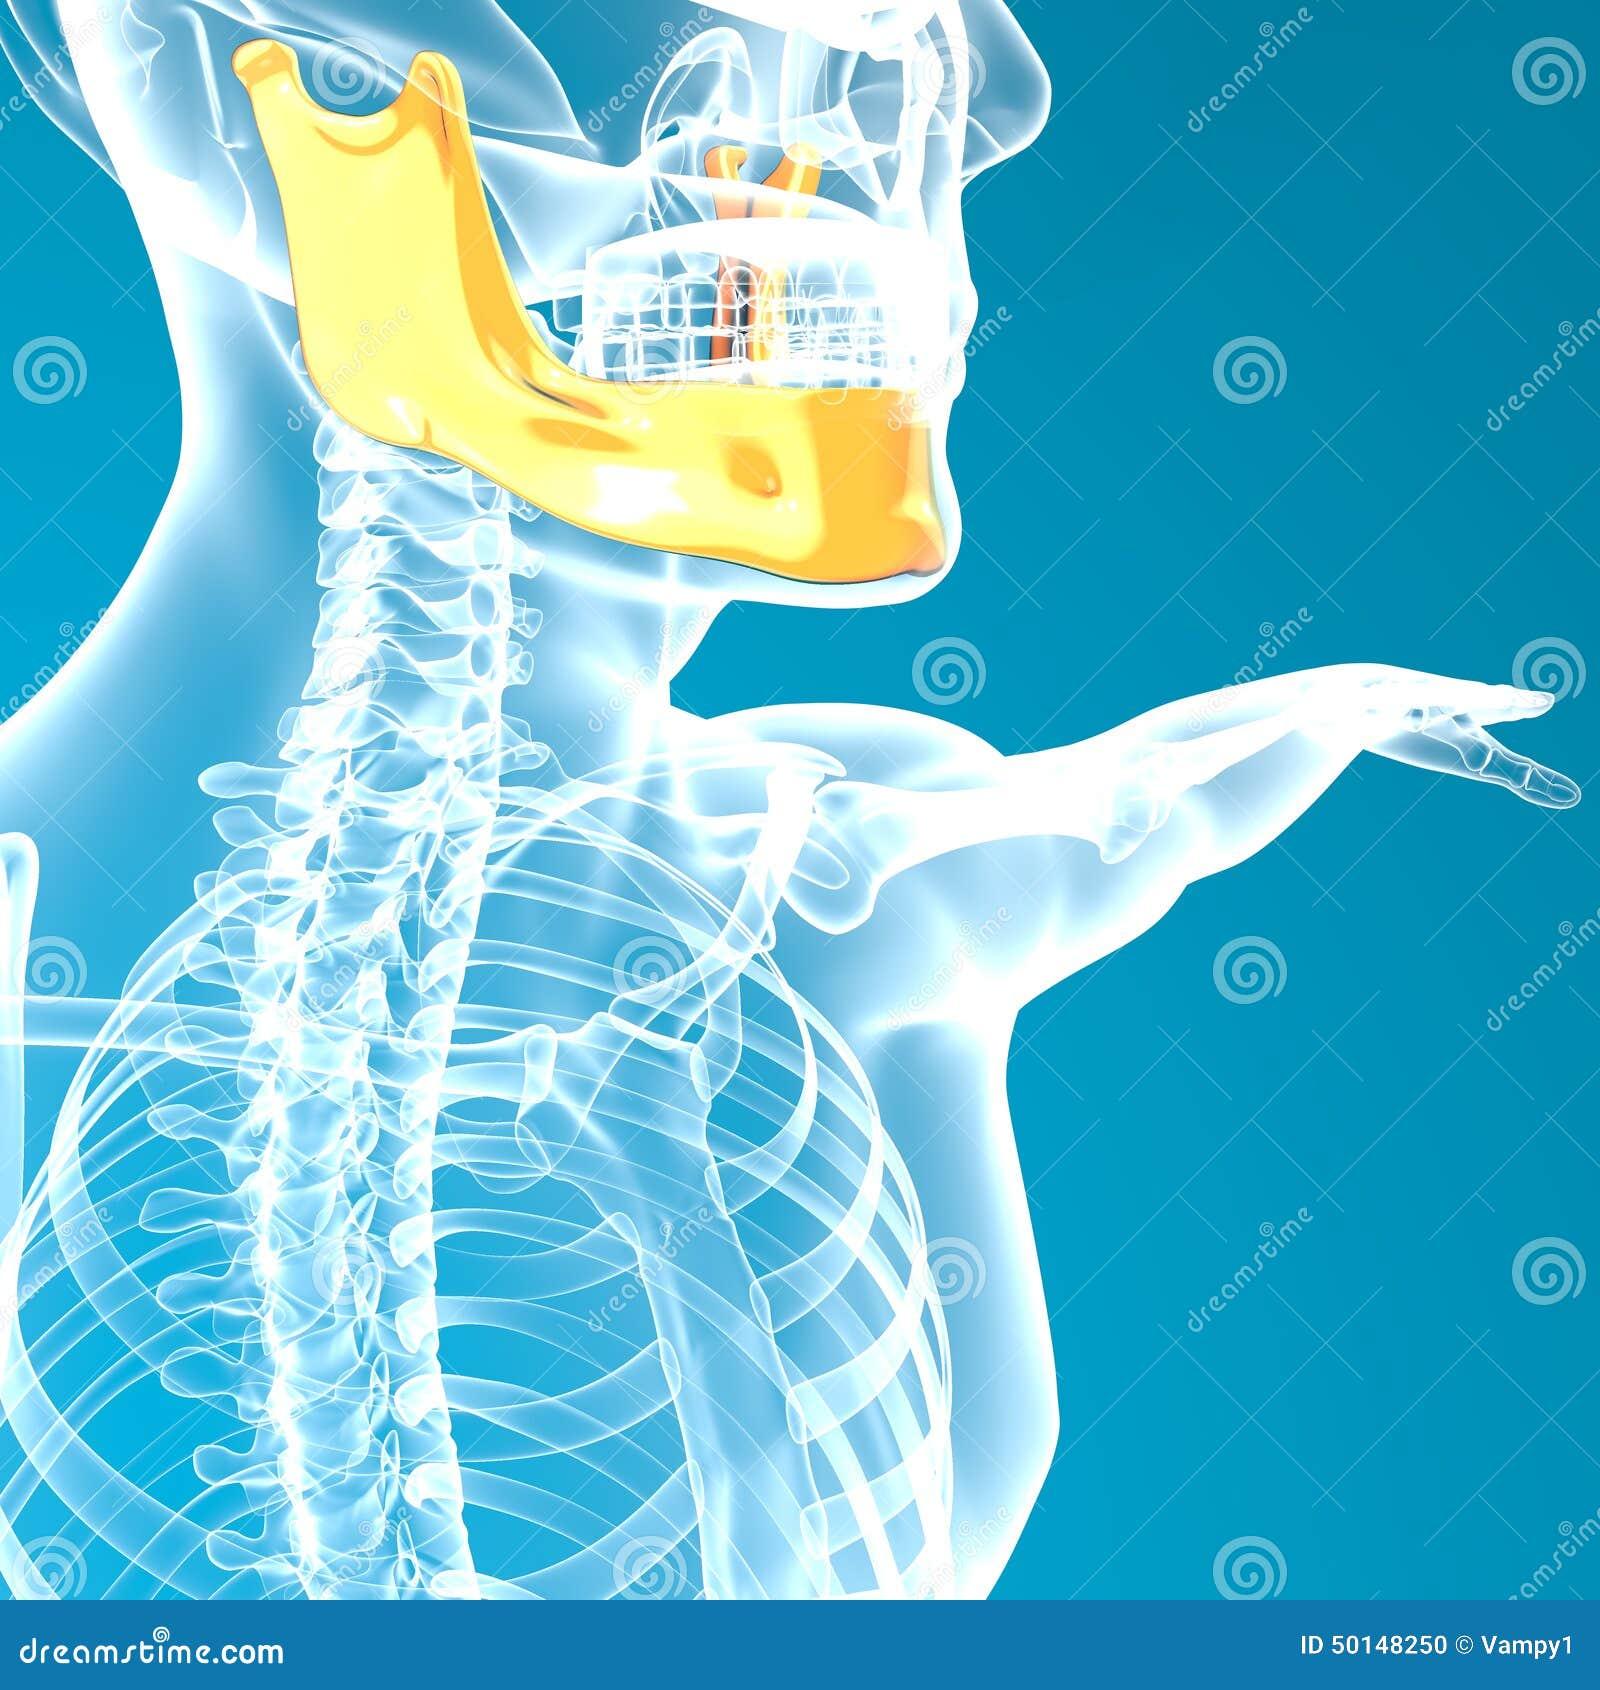 Jaw Bone Head X Ray Stock Illustration Illustration Of Study 50148250